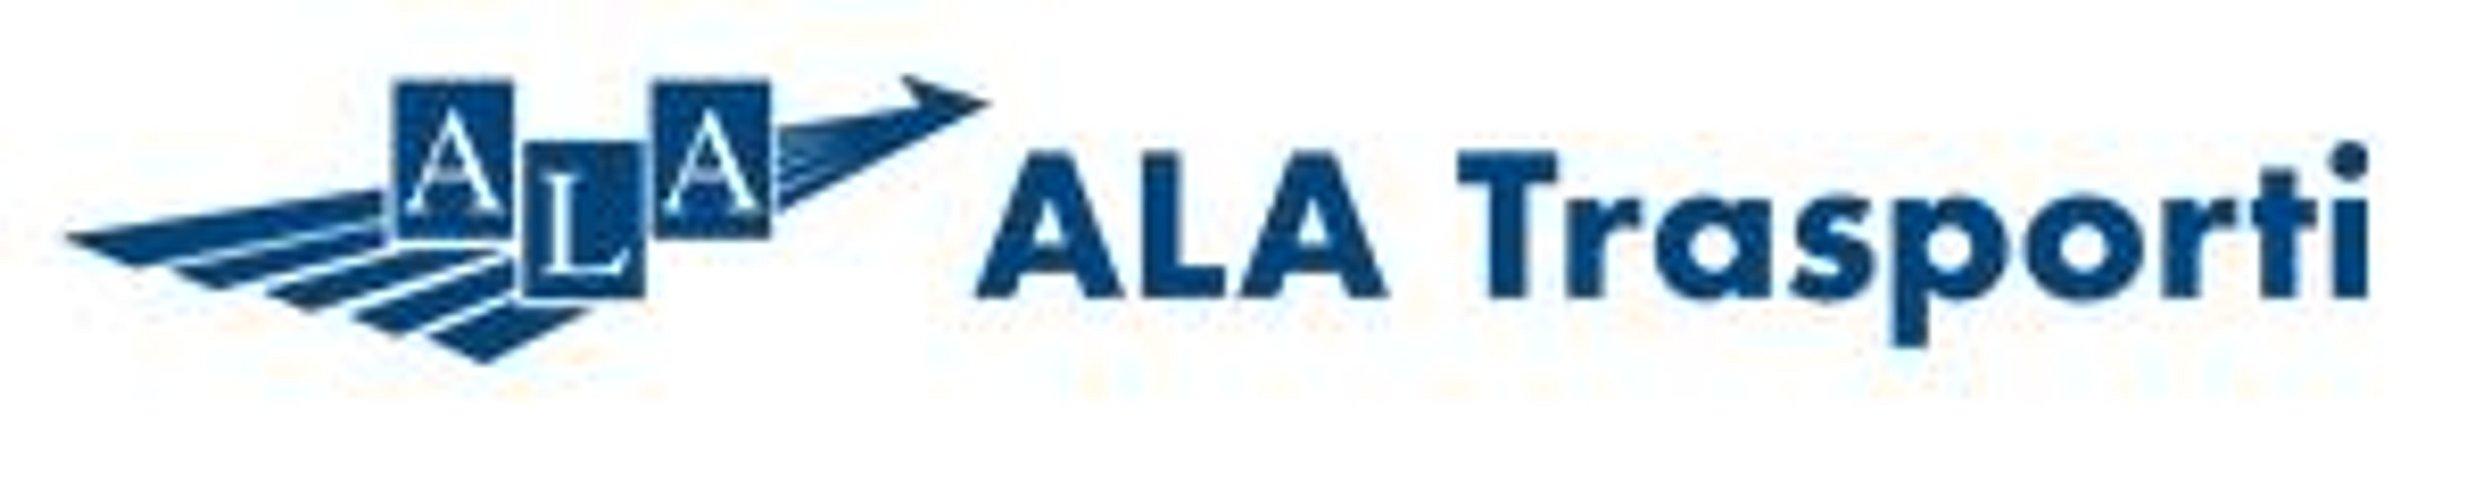 Ala Trasporti SA